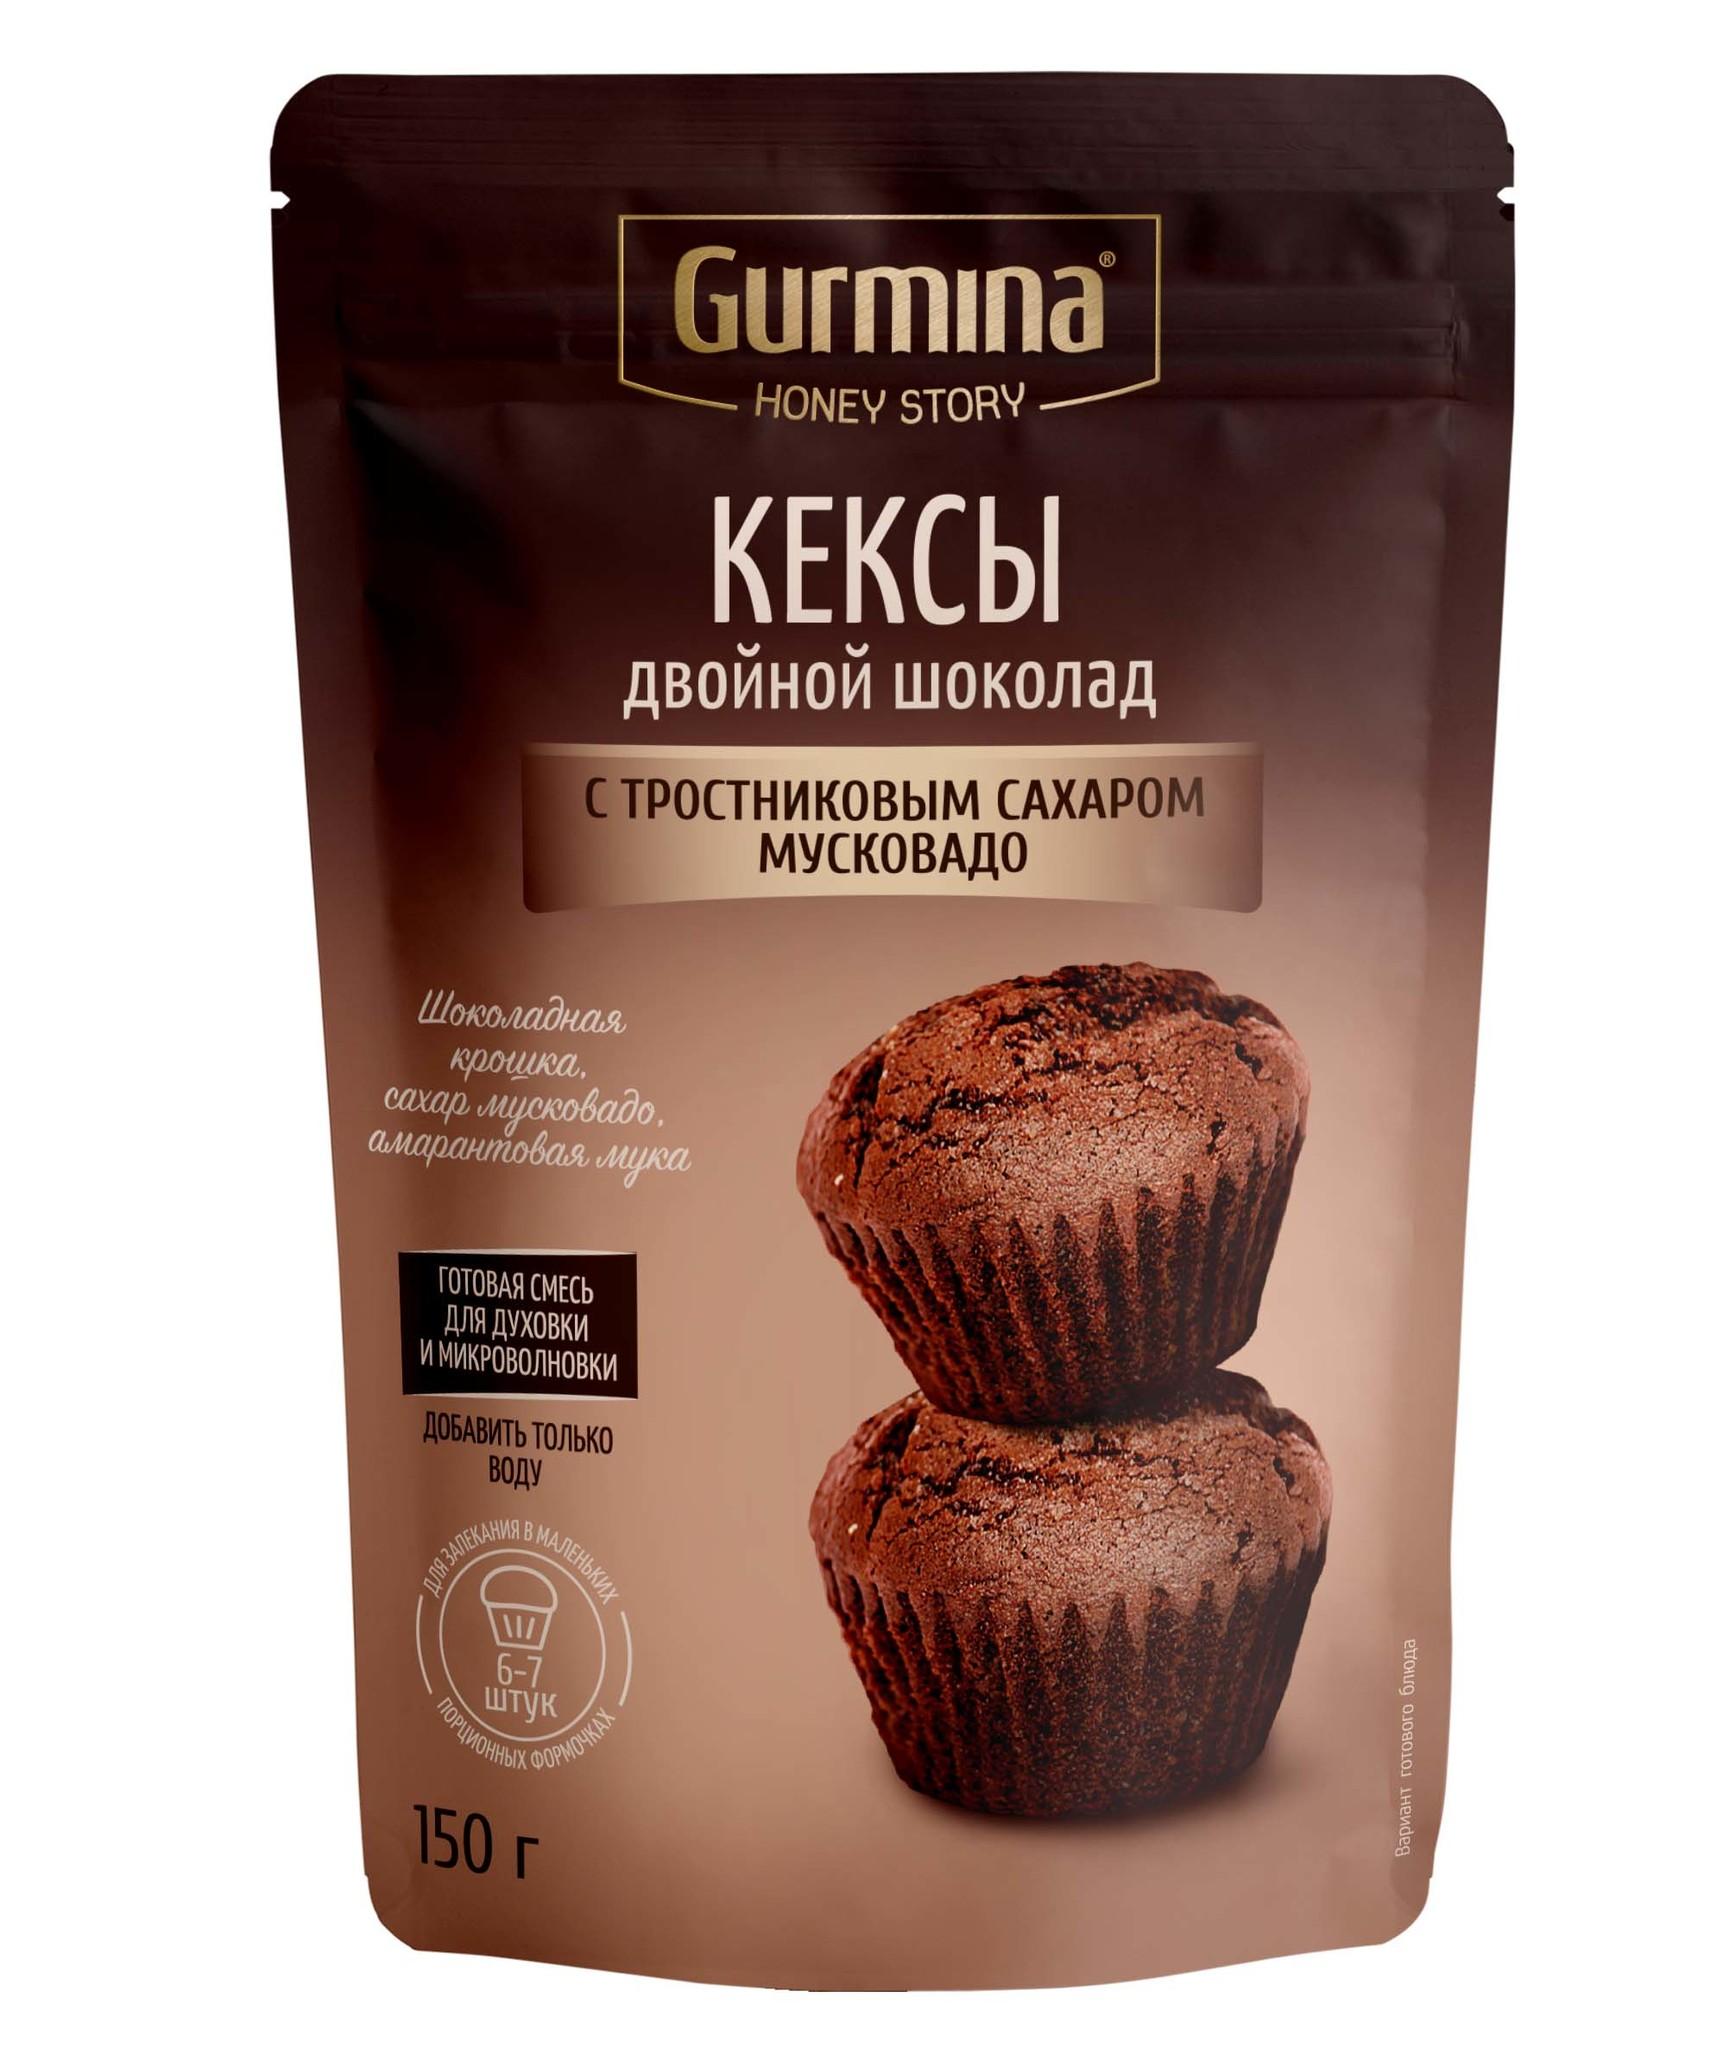 Кексы двойной шоколад, 150г.